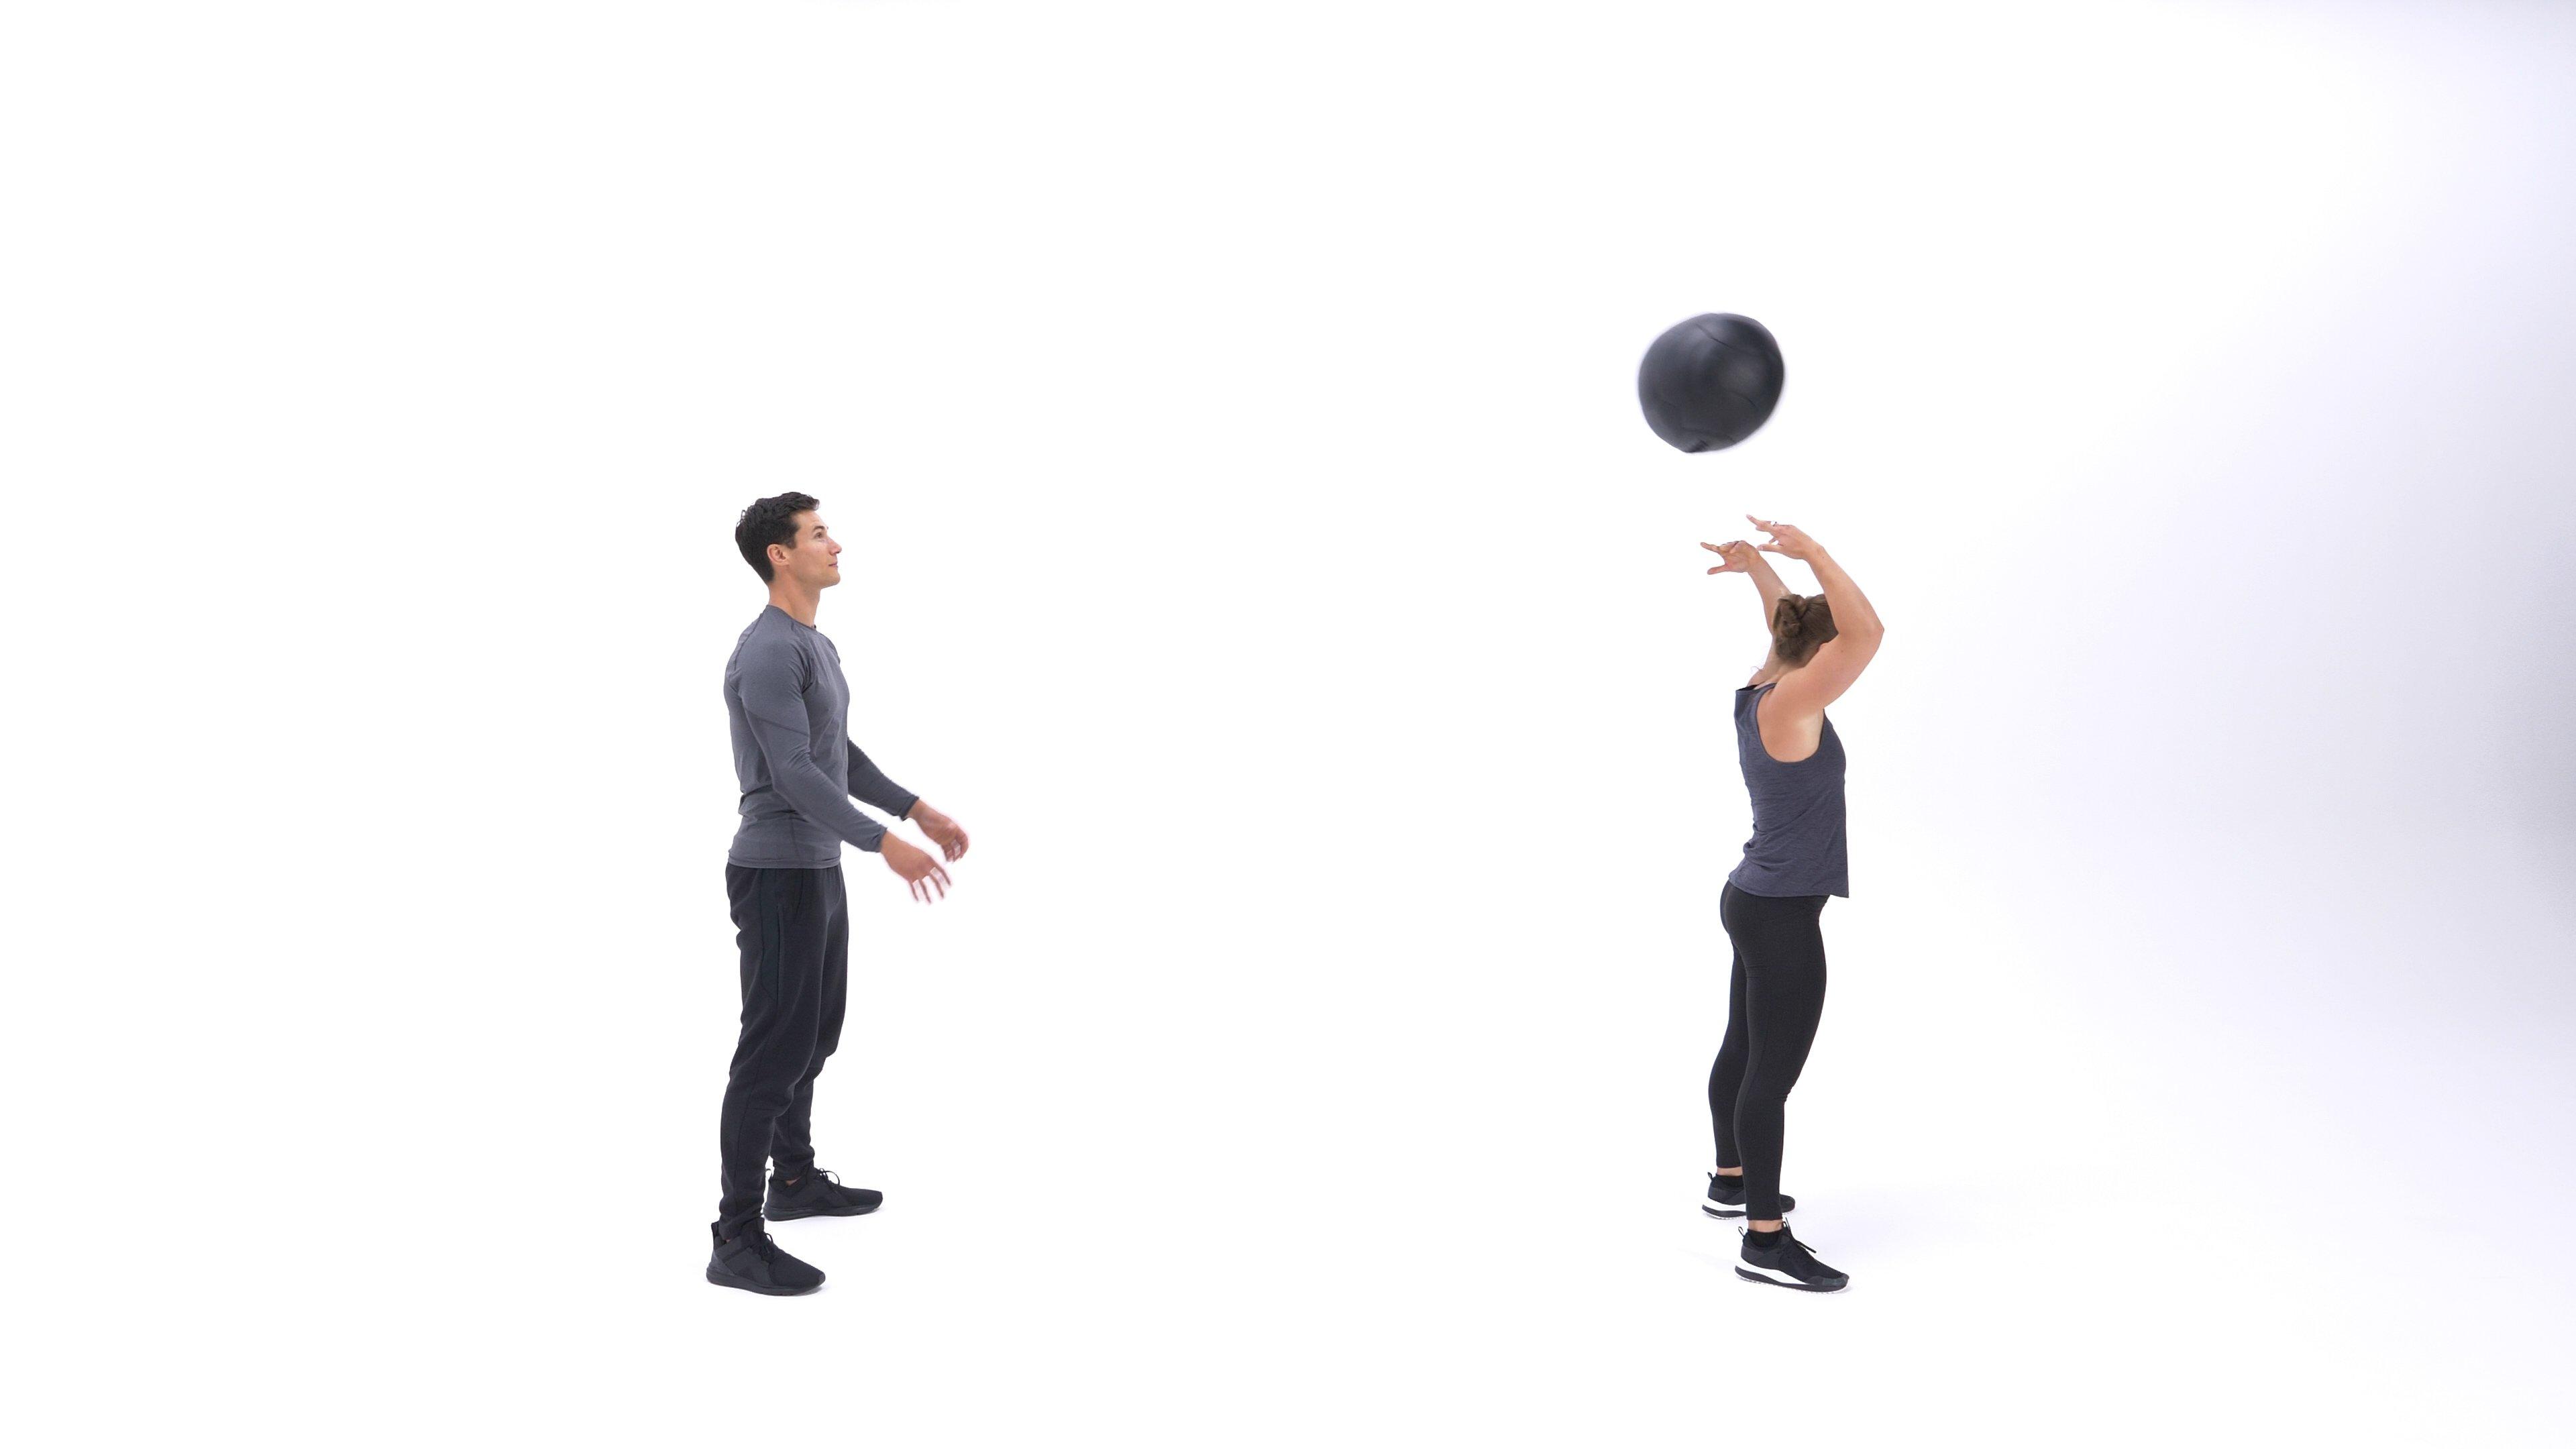 Medicine ball scoop throw image